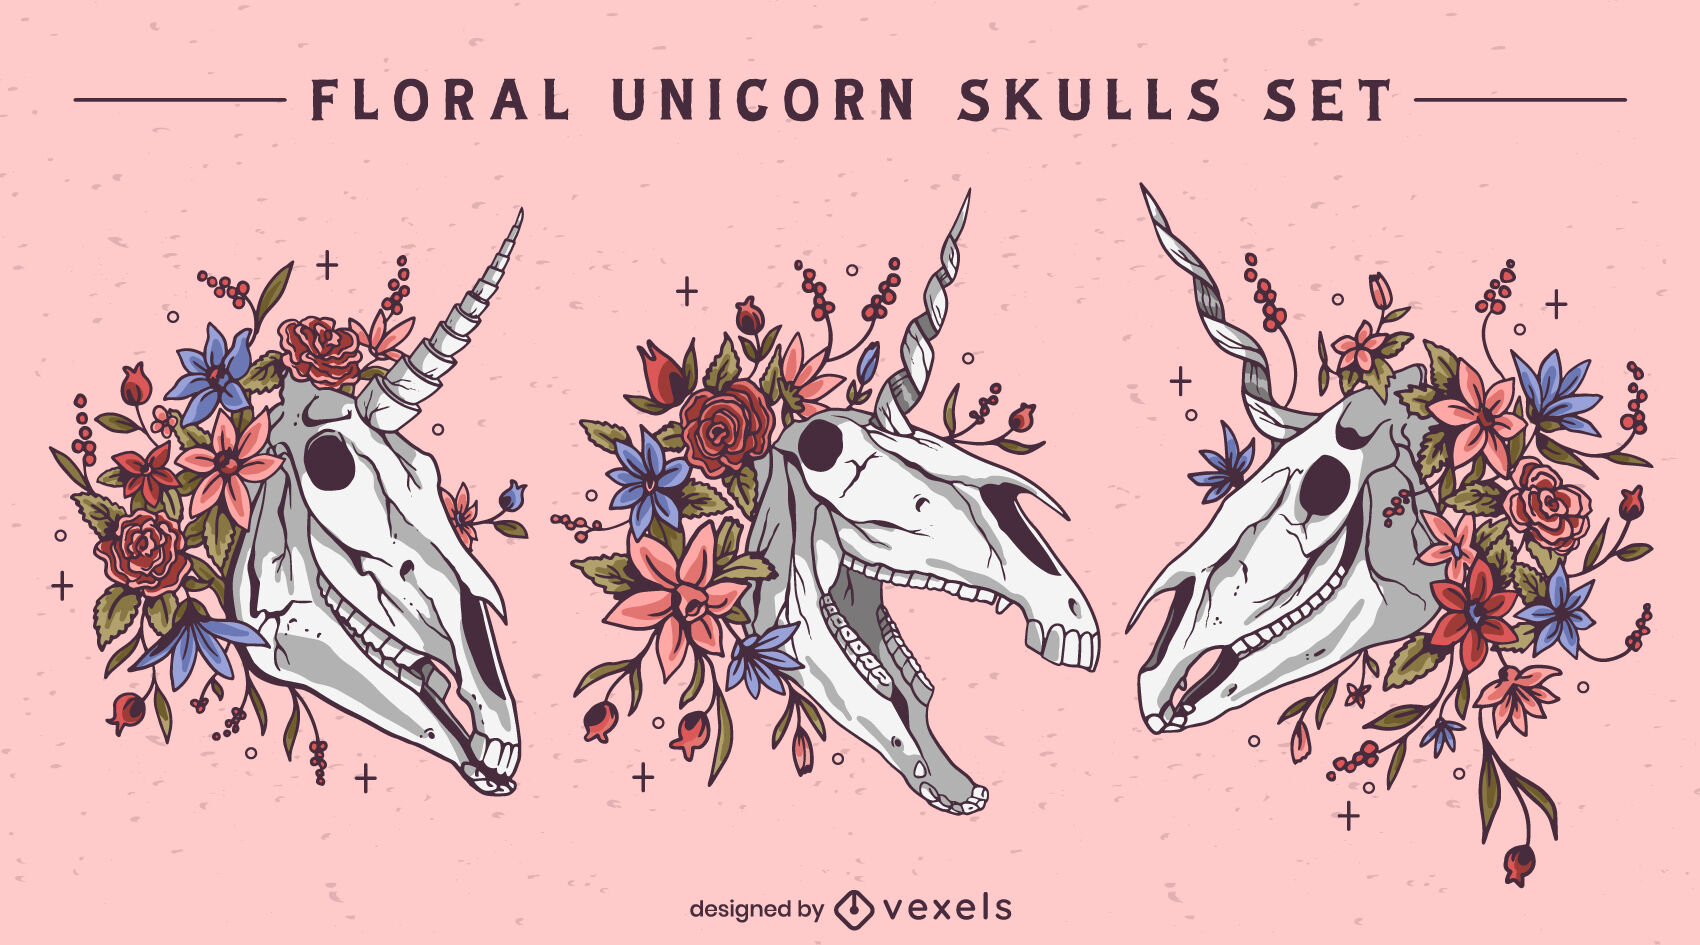 Conjunto de naturaleza muerta de unicornio floral skuls